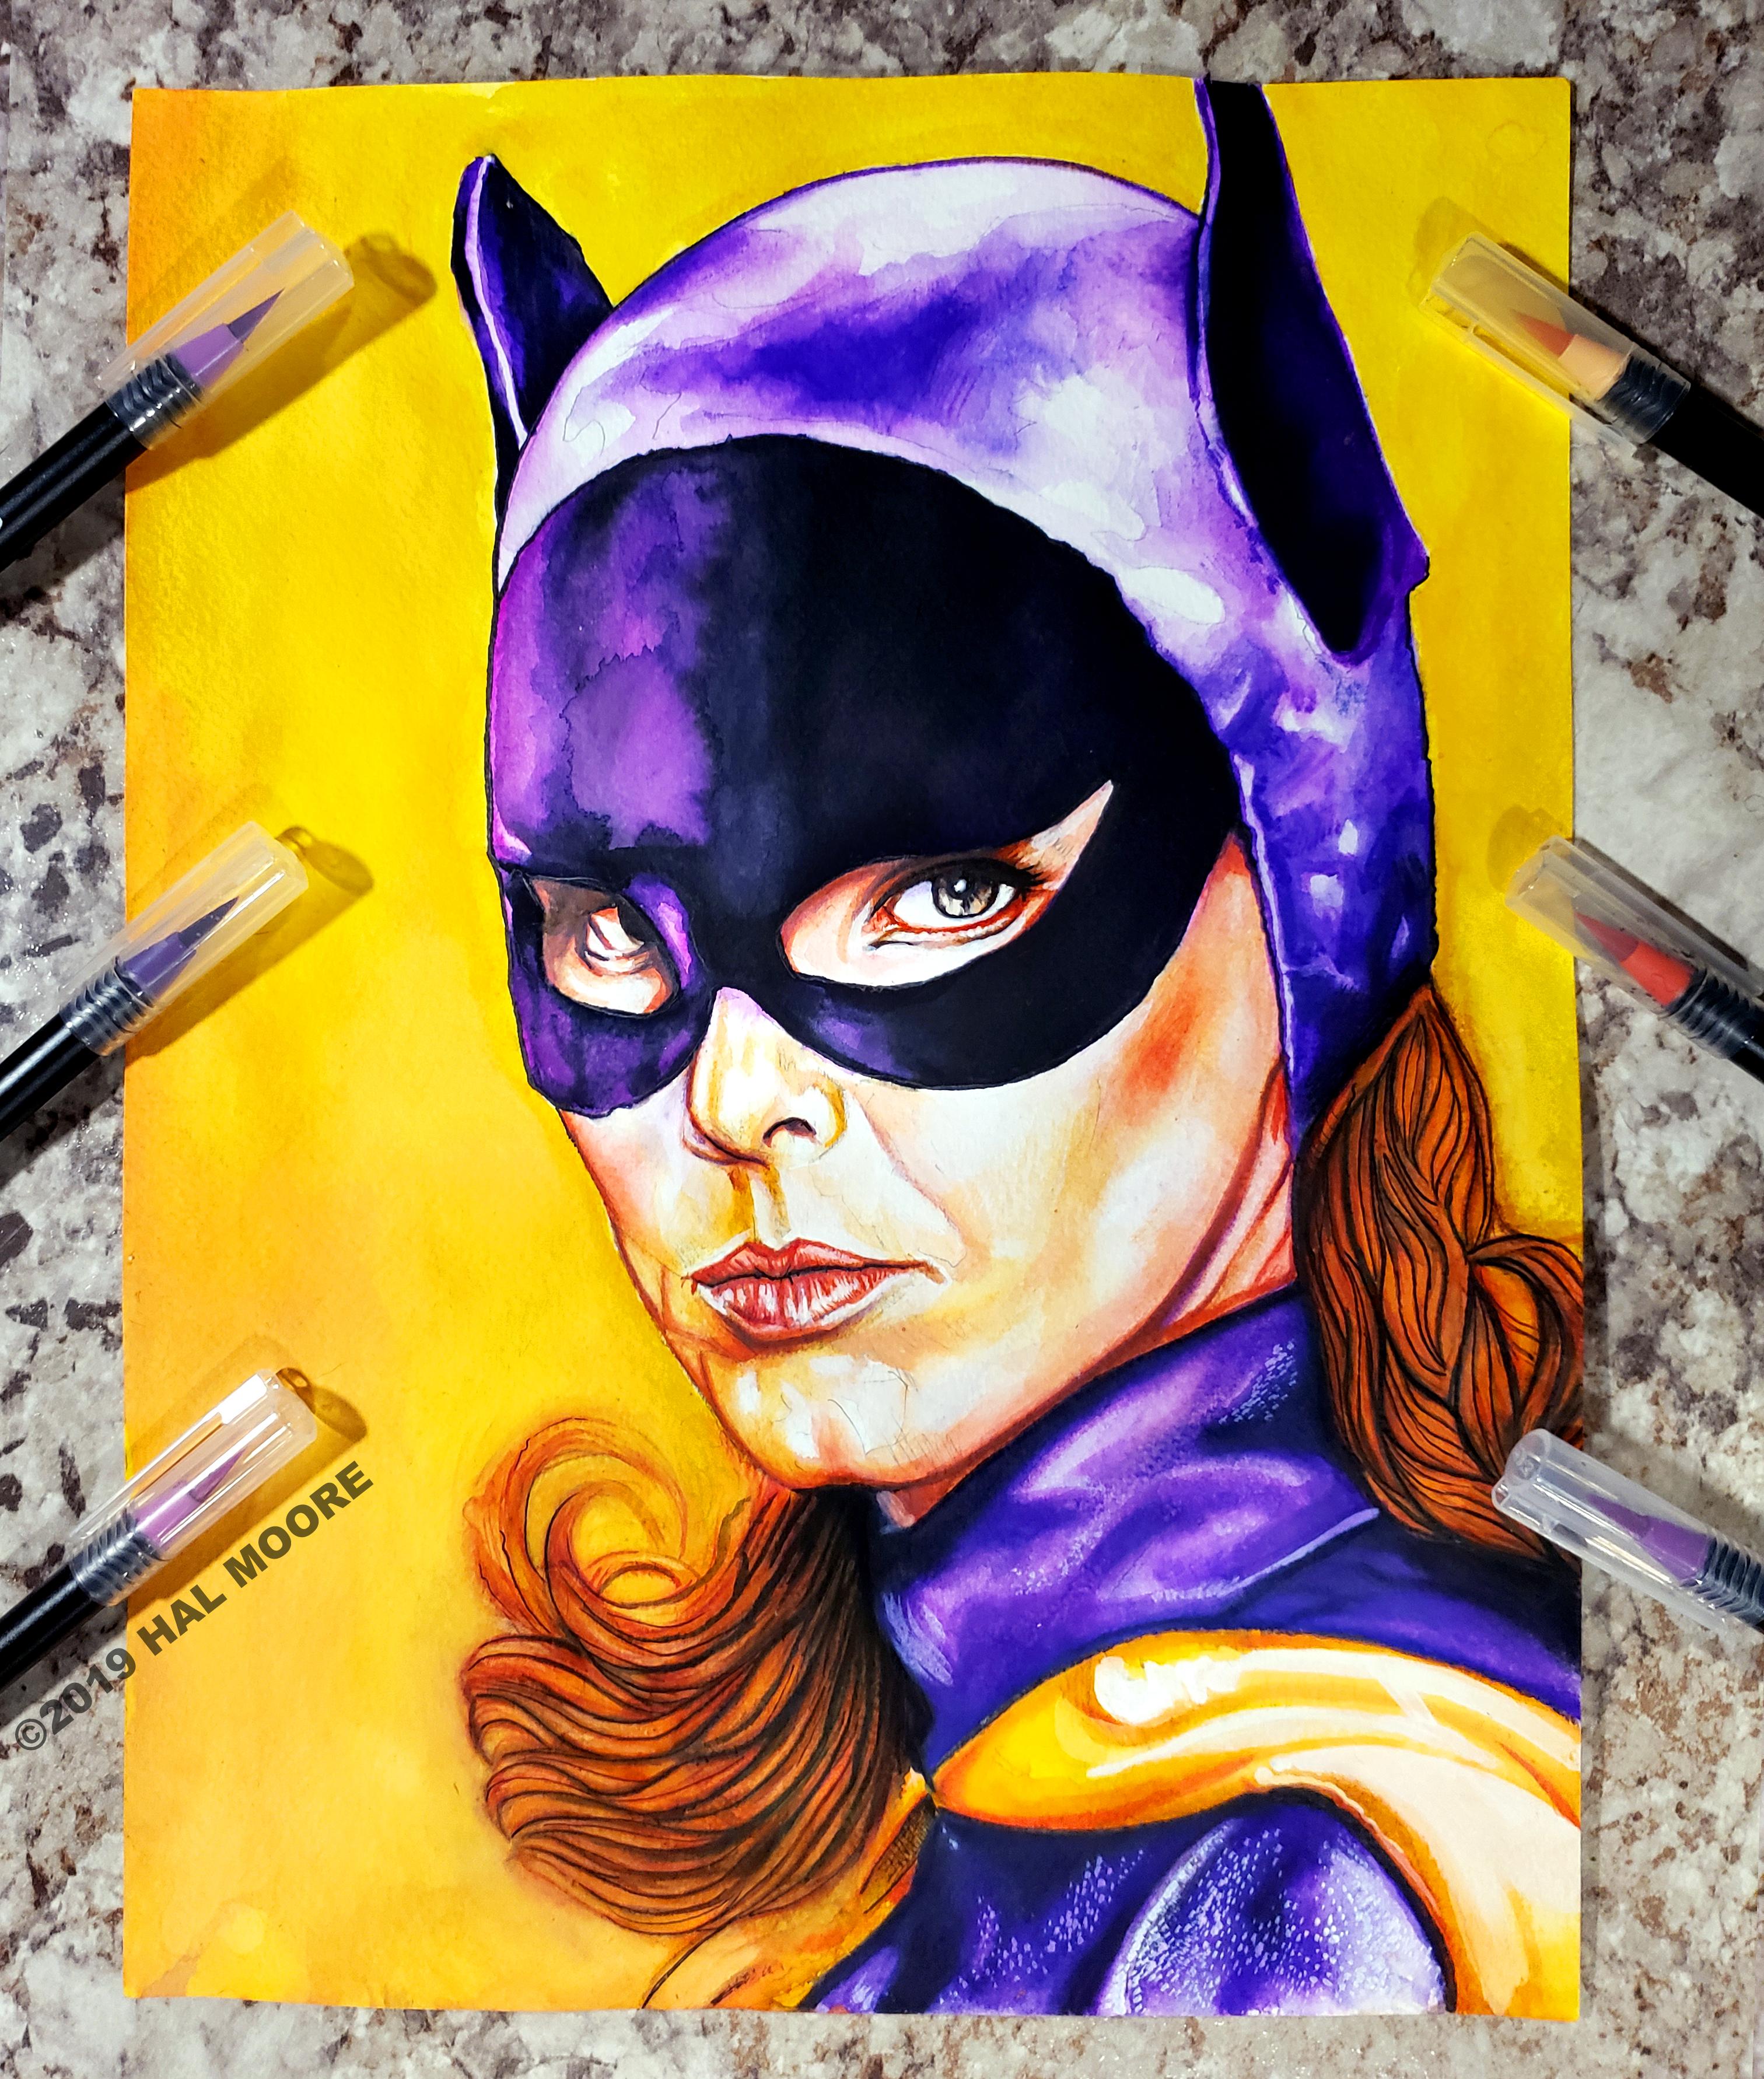 batgirl Final pic